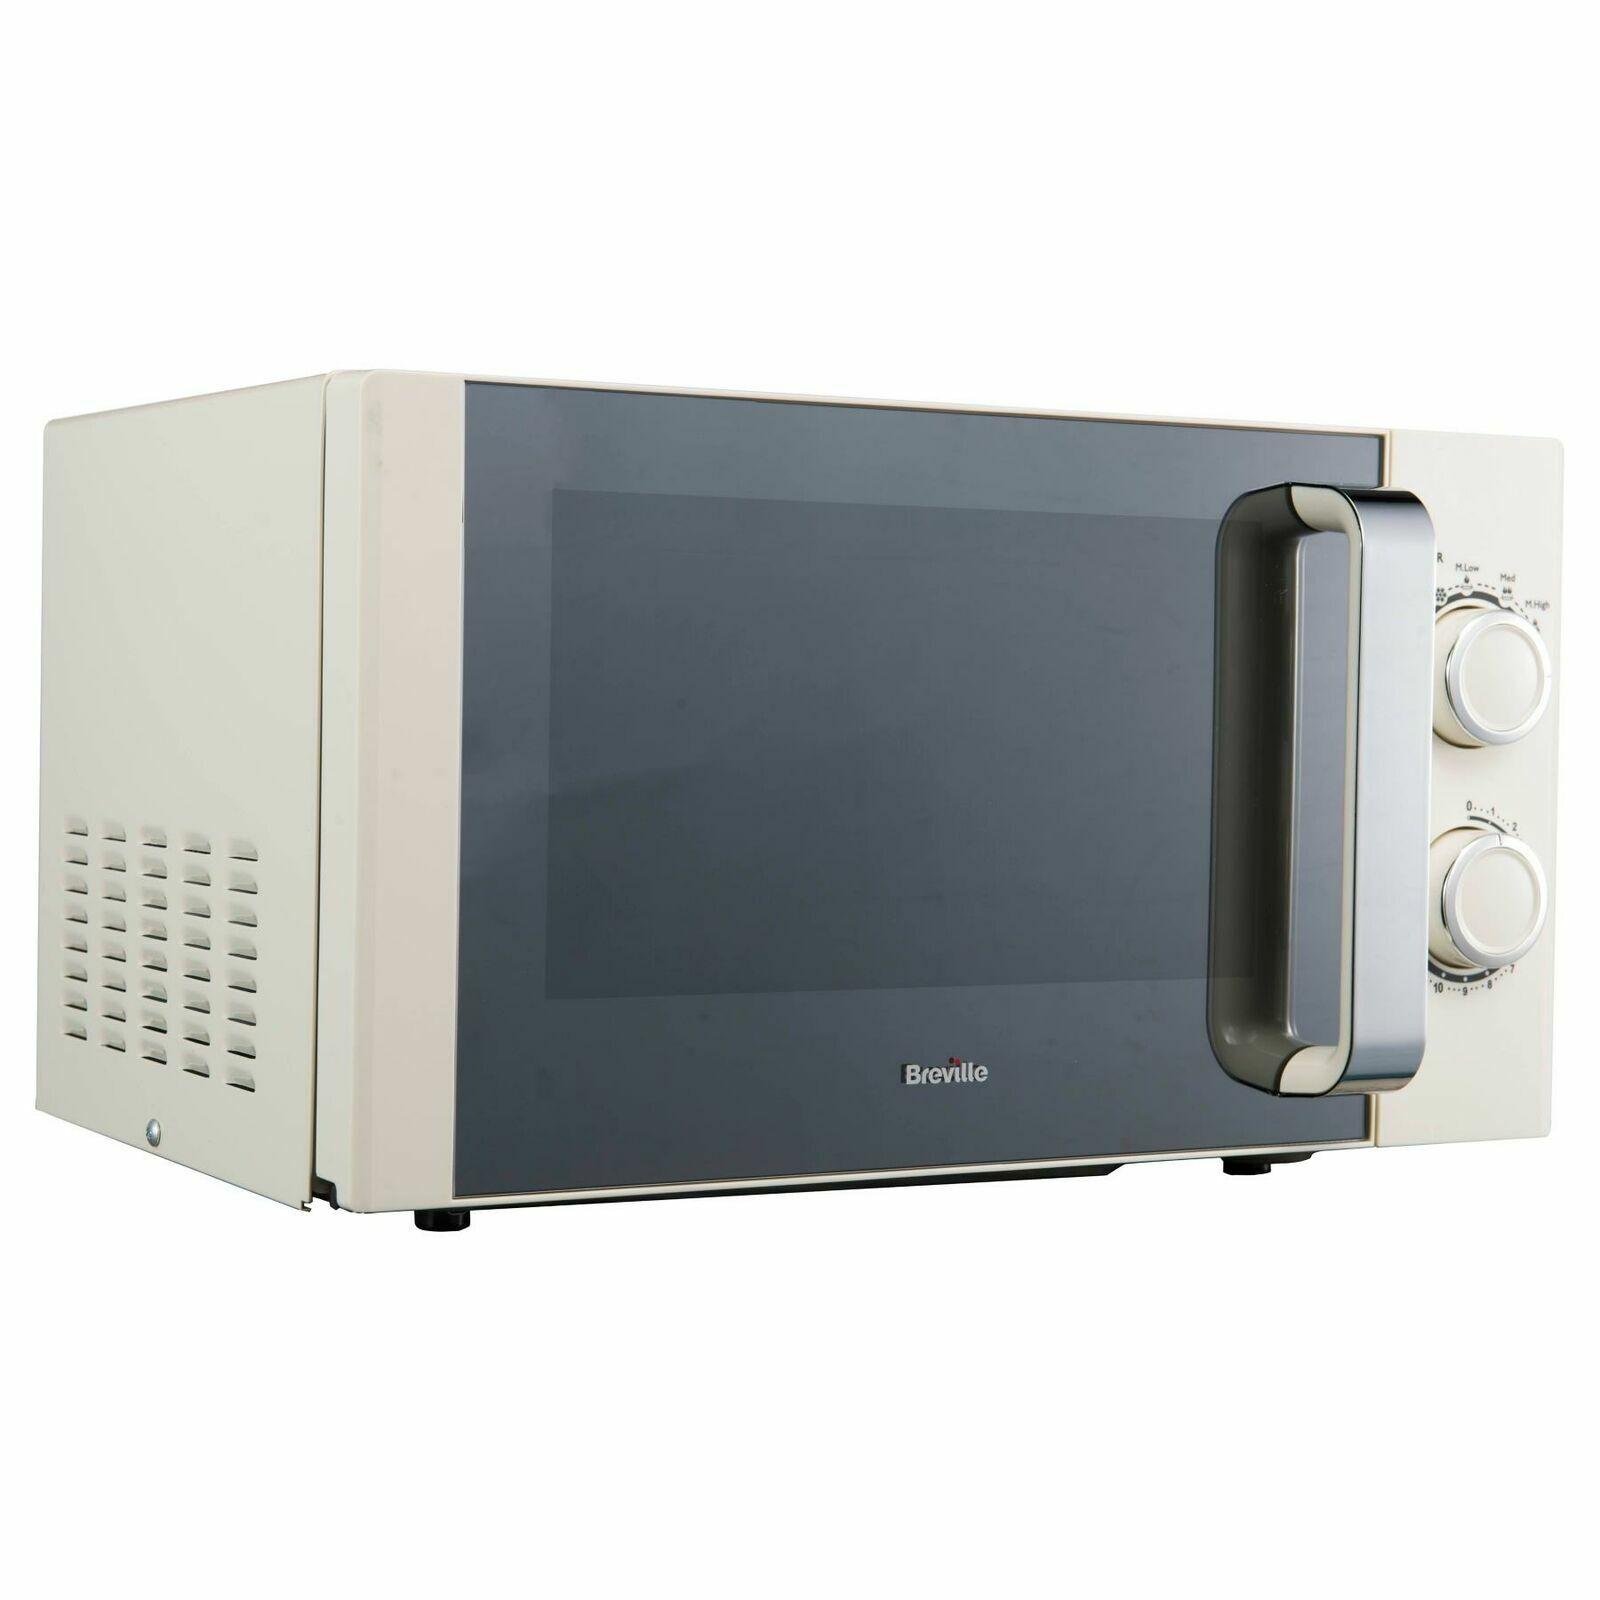 Cream Microwave Oven Manual 17L Cheap Buy Sale Kitchen Brevi